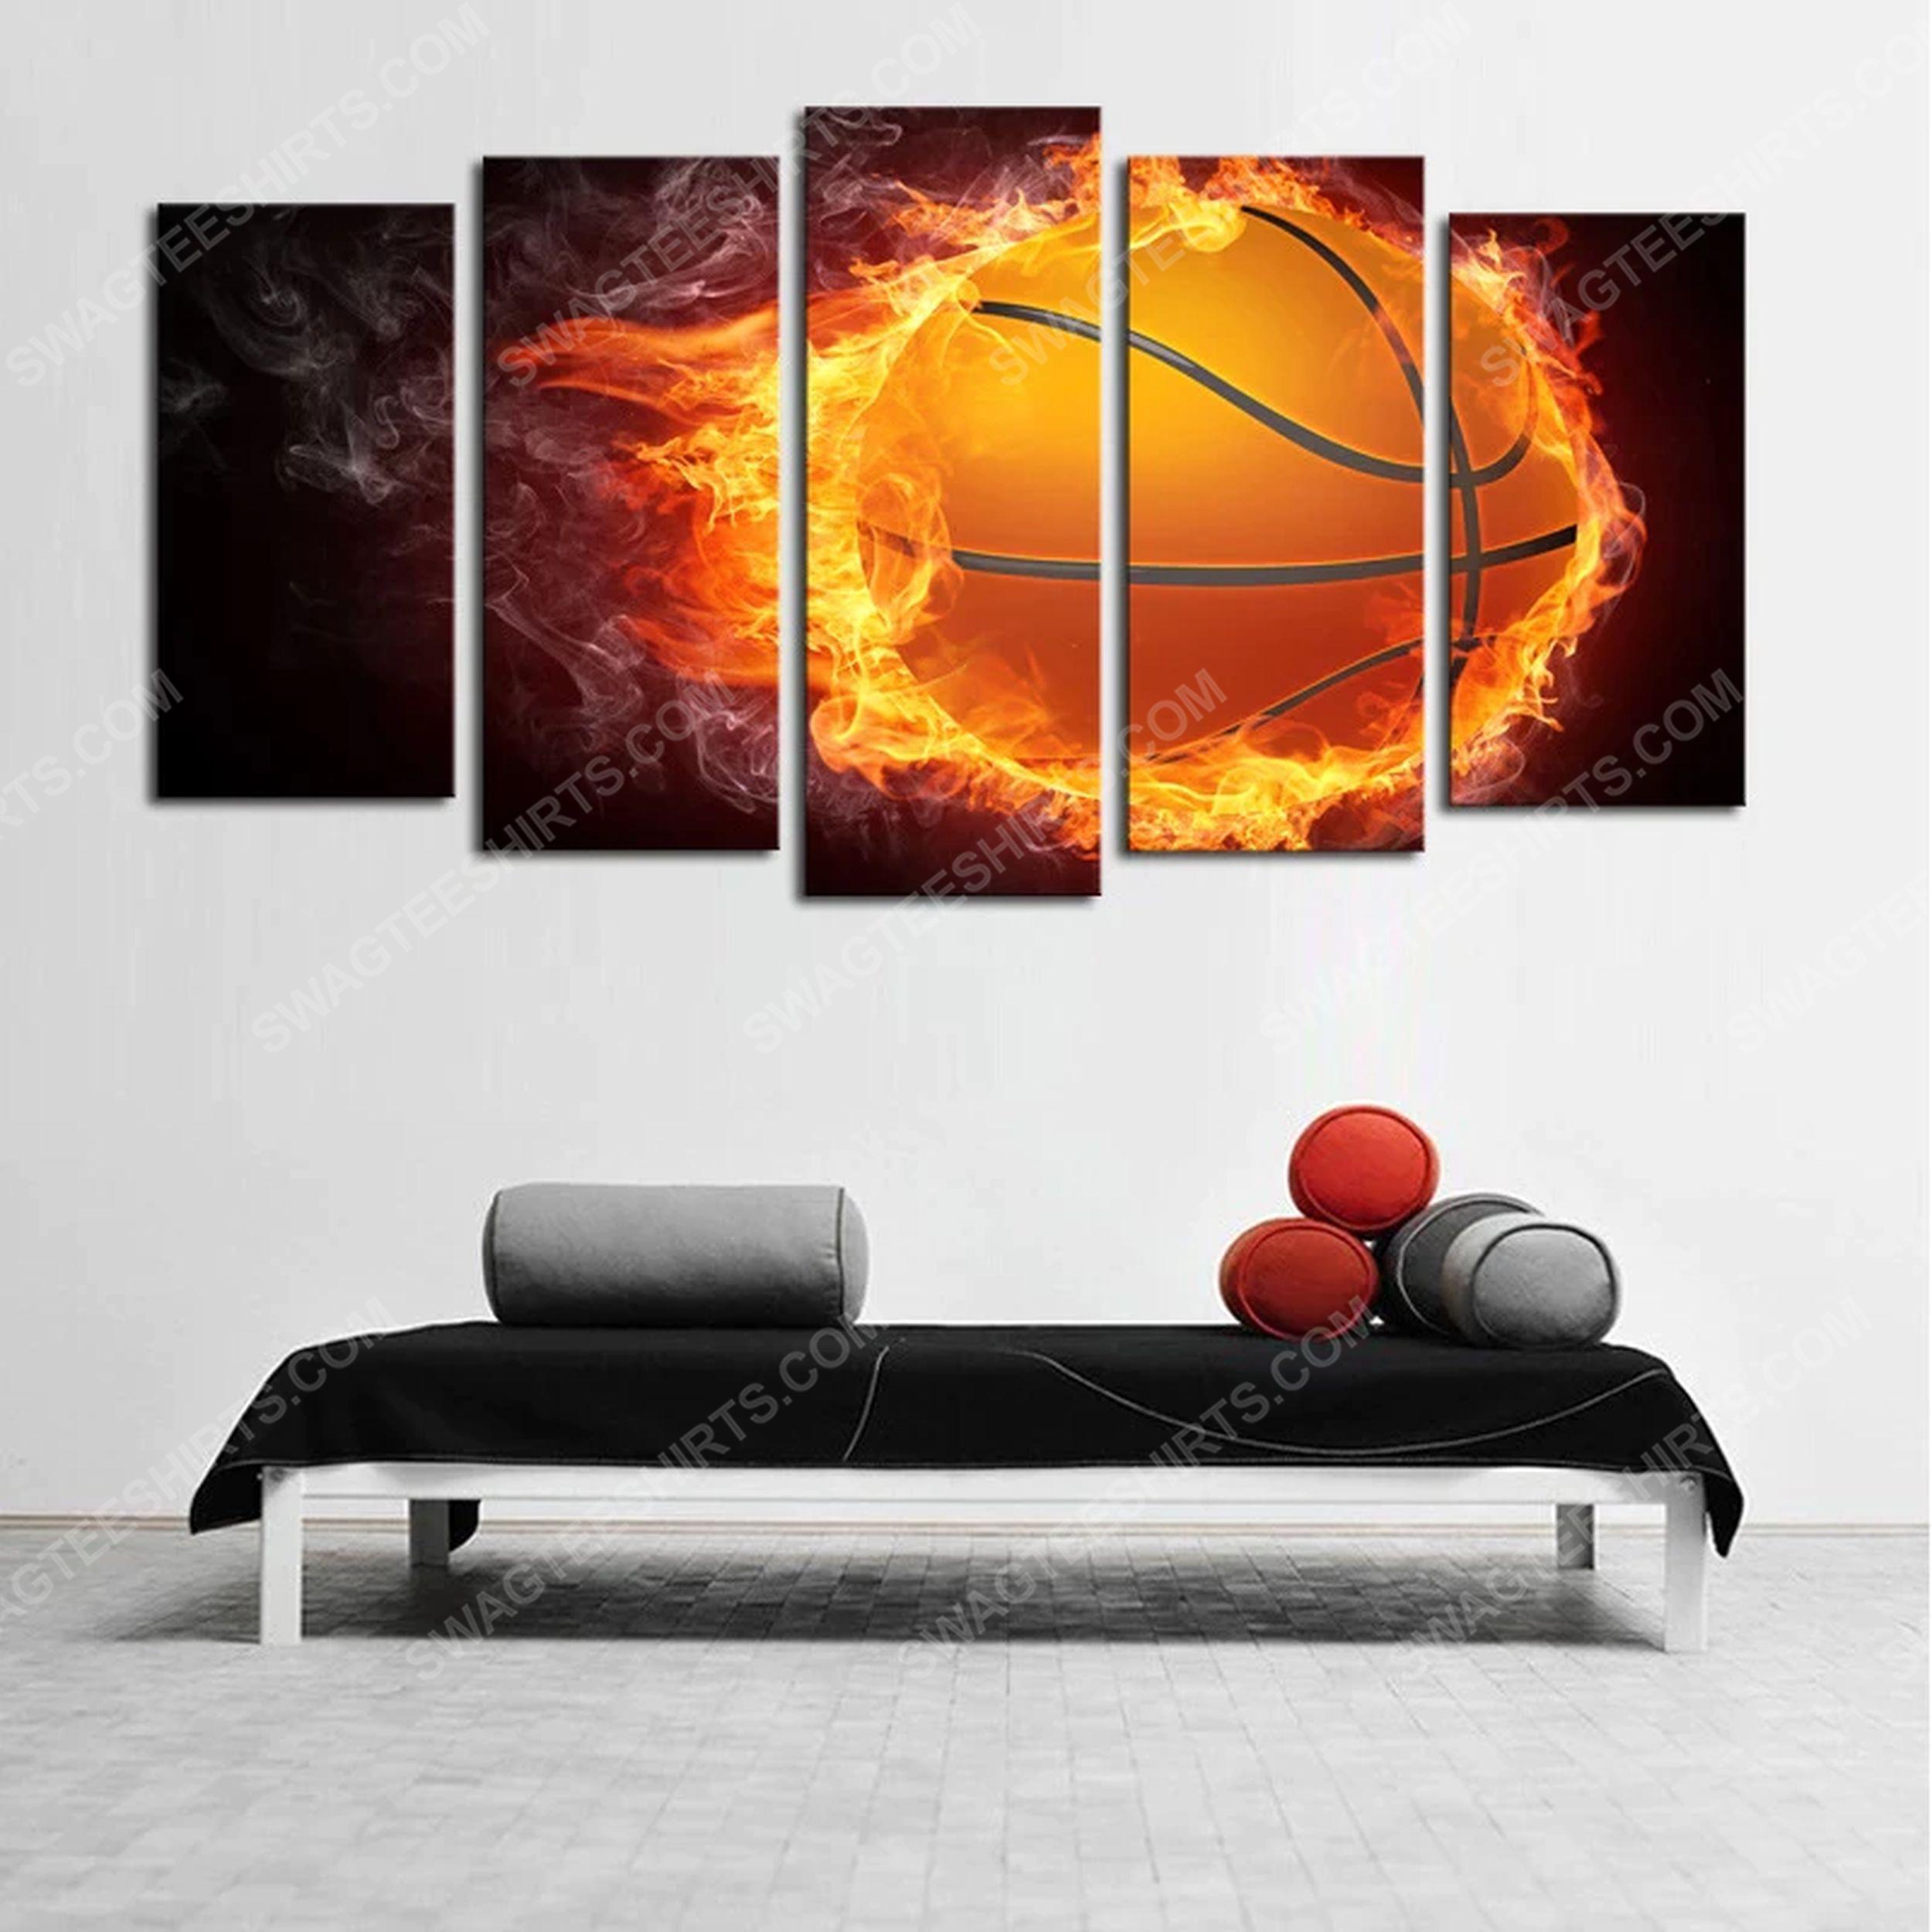 Fire basketball theme print painting canvas wall art home decor